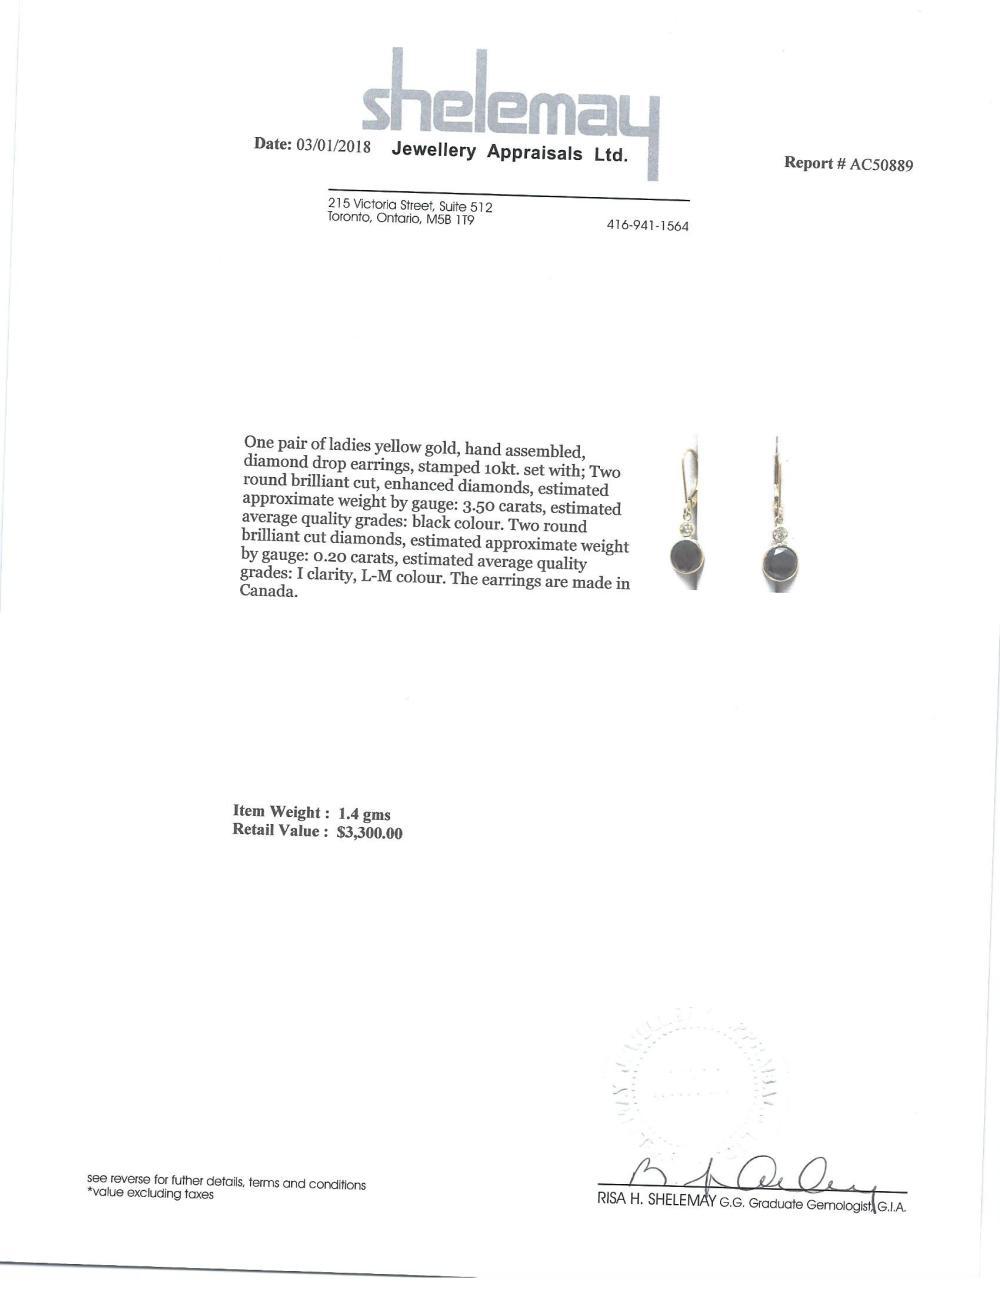 Certified 10K Black Diamond(3.5ct) Diamond(0.2ct) Earrings